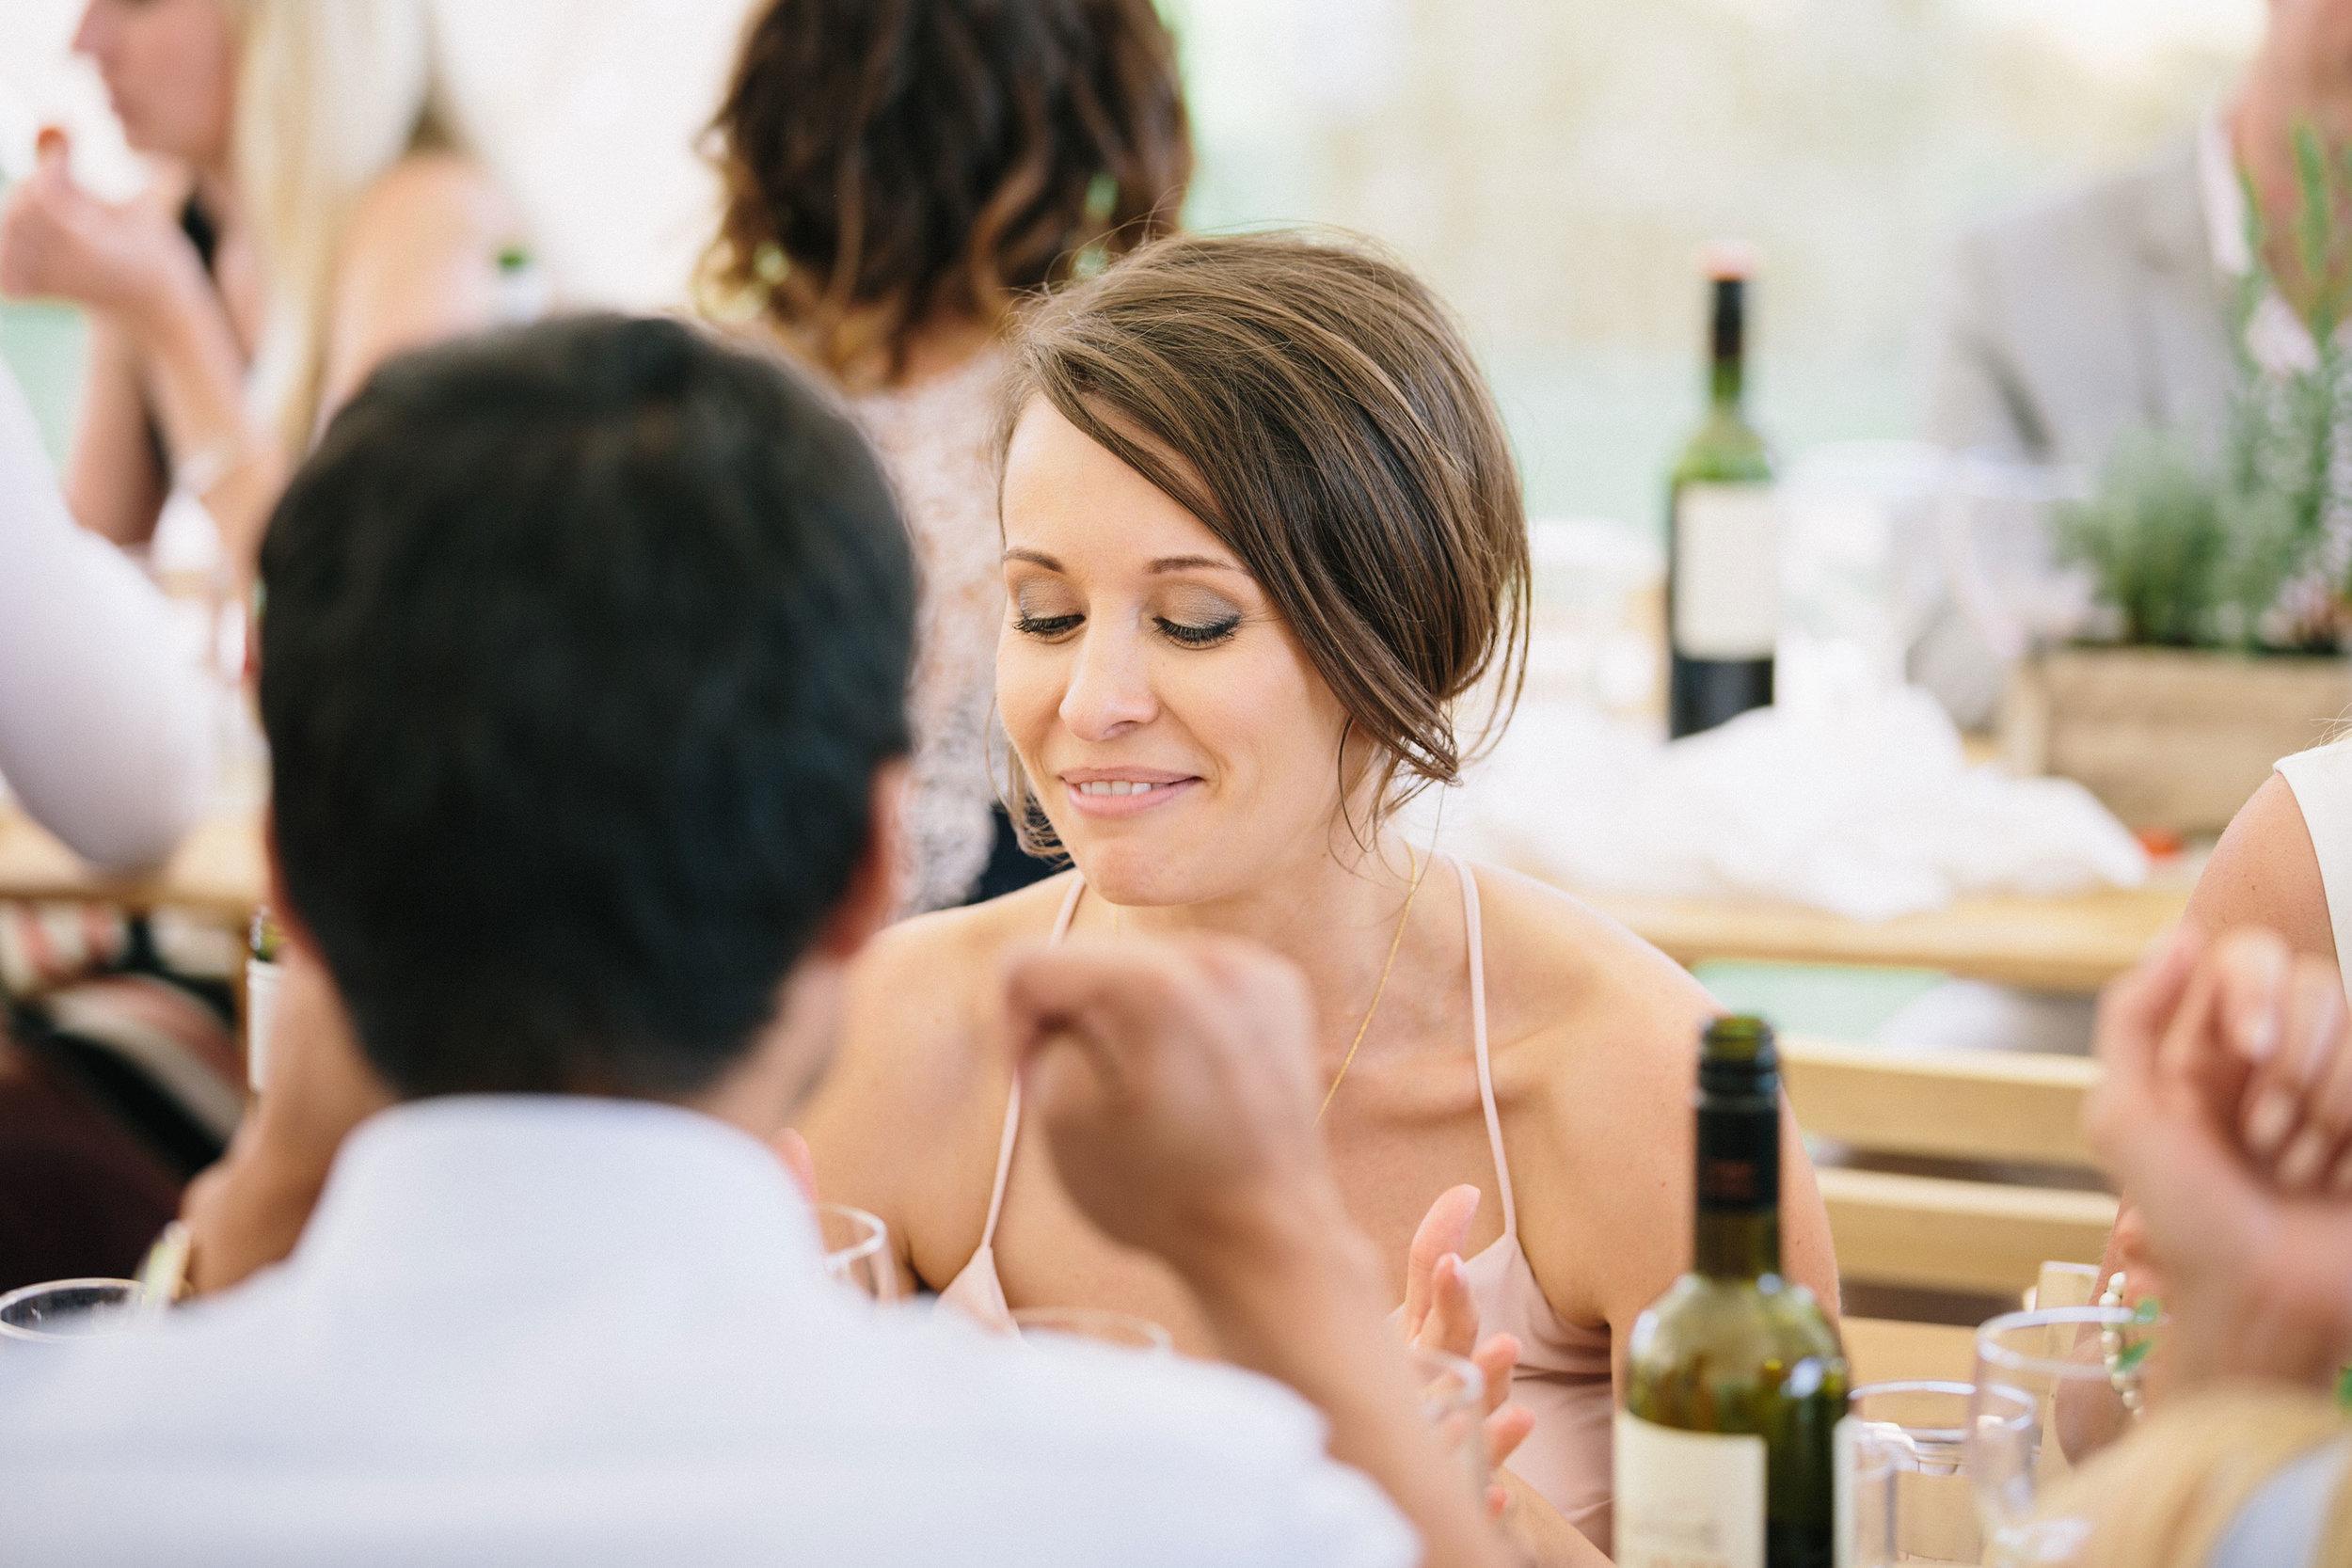 Becky-&-Jon---Aug16---Michael-Newington-Gray-441.jpg